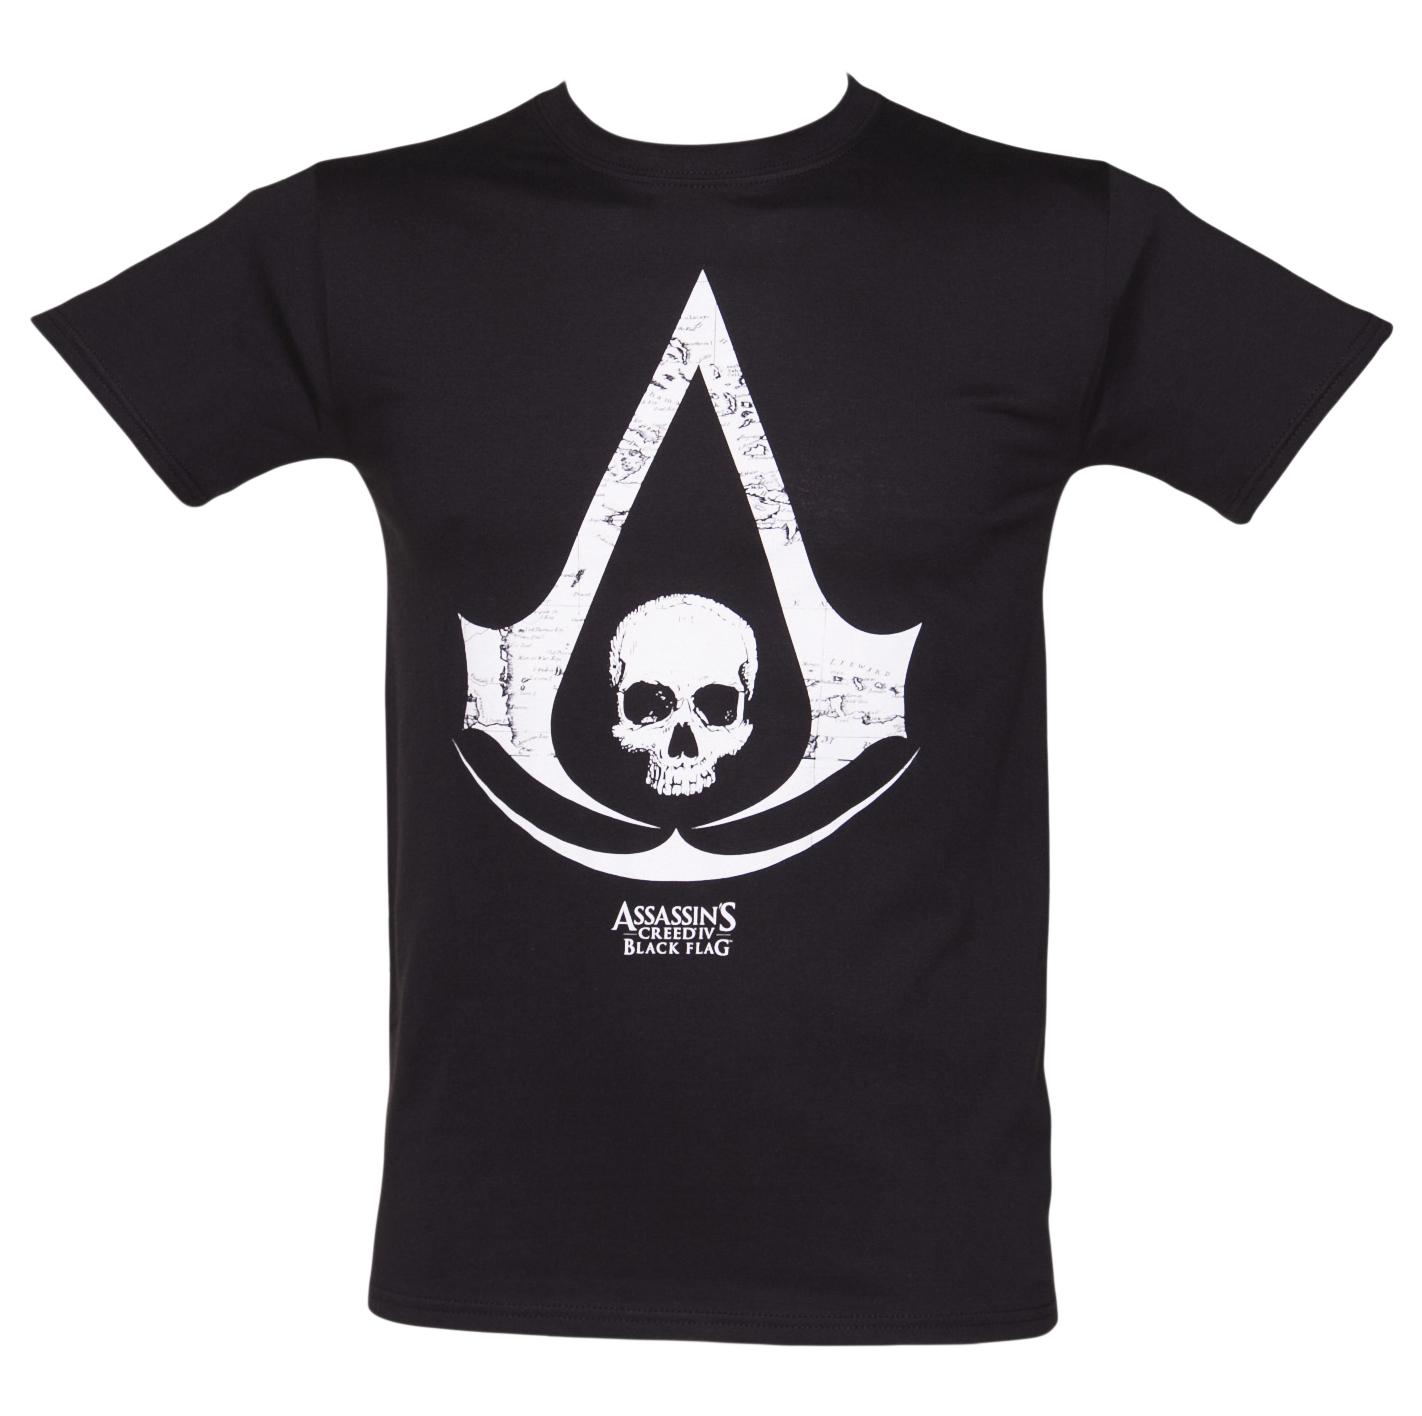 Assassin's Creed IV Black Flag T-Shirt 1